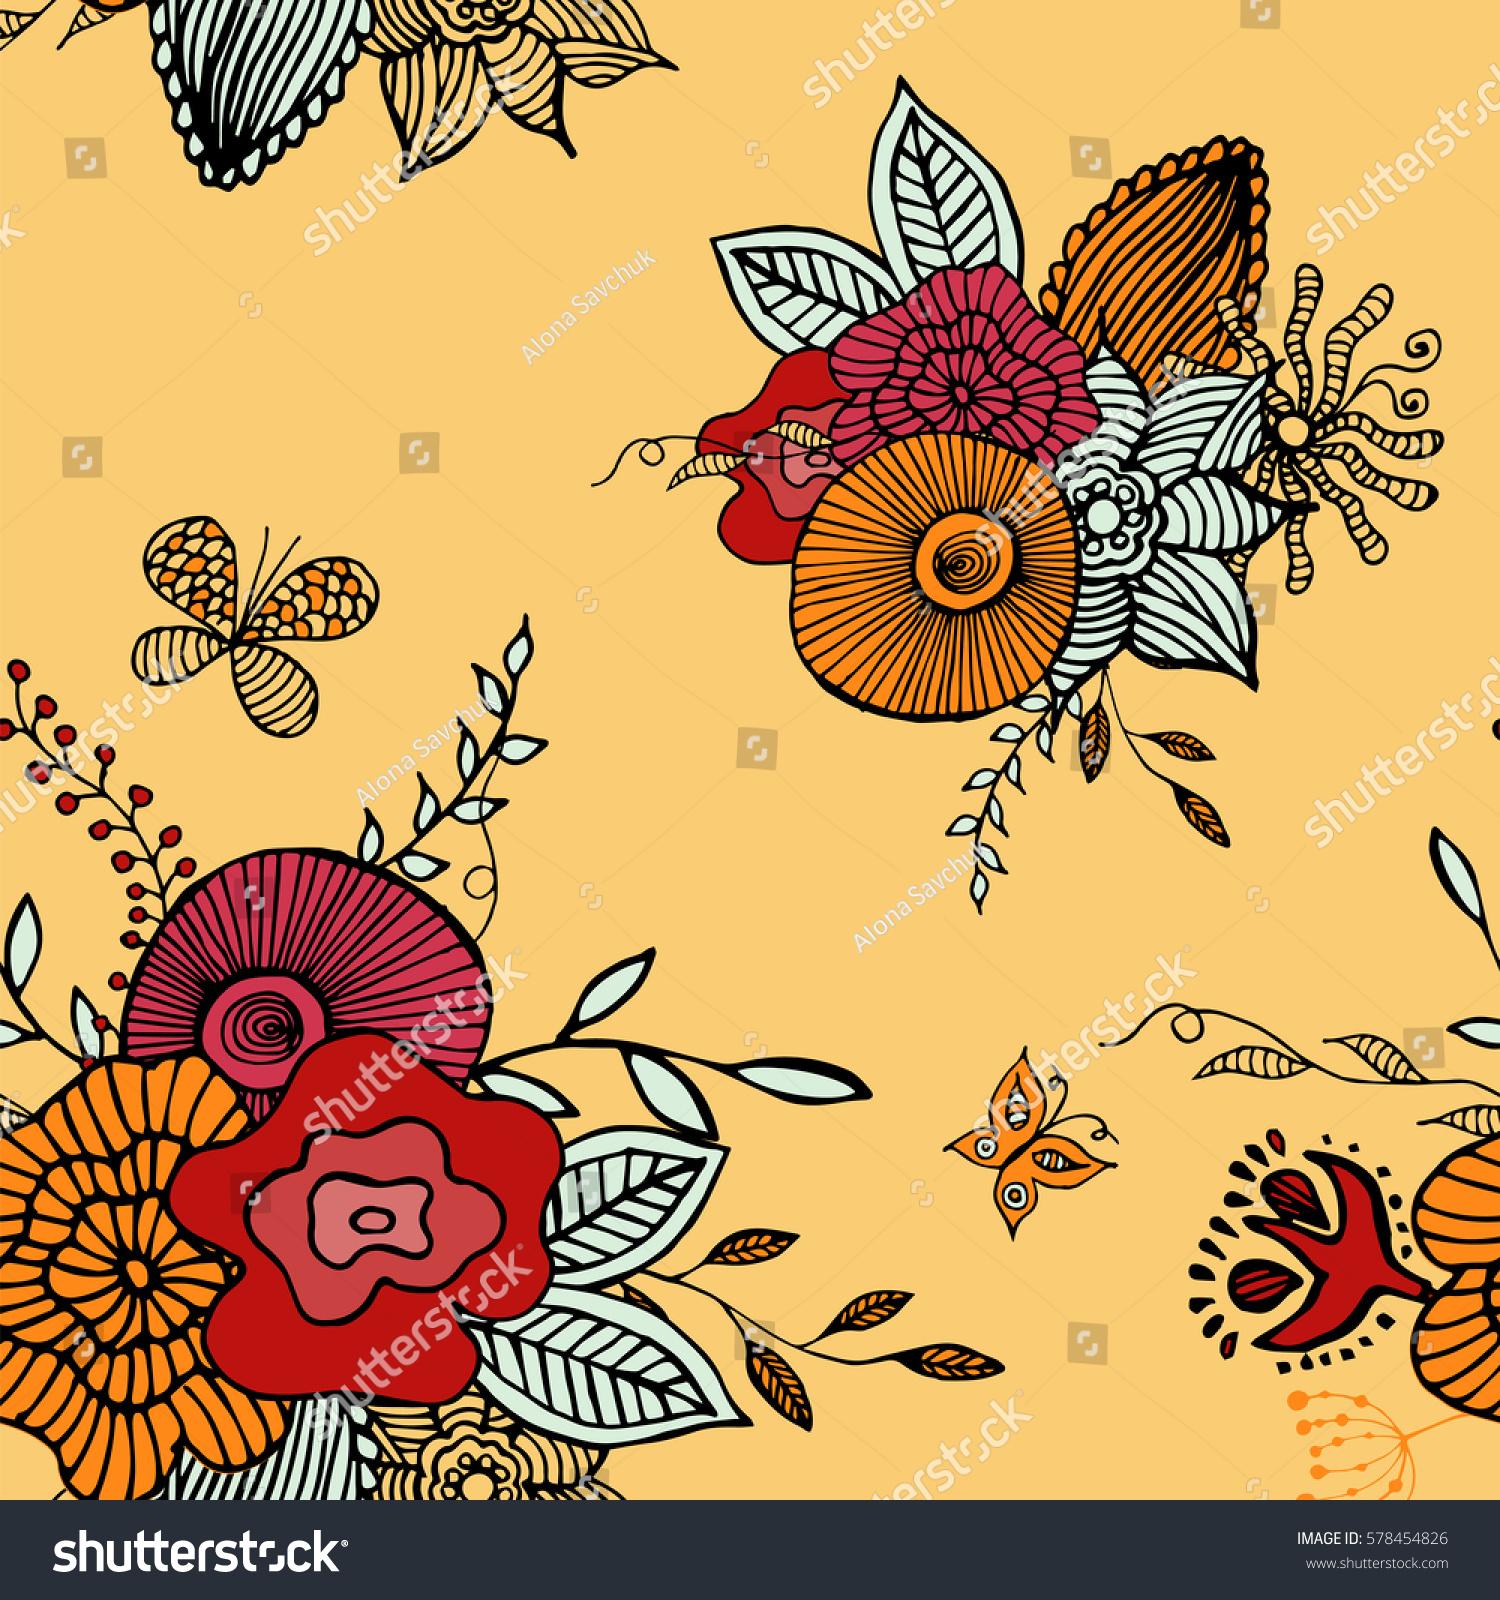 Botanic Texture Detailed Flowers Illustrations Doodle Stock Vector